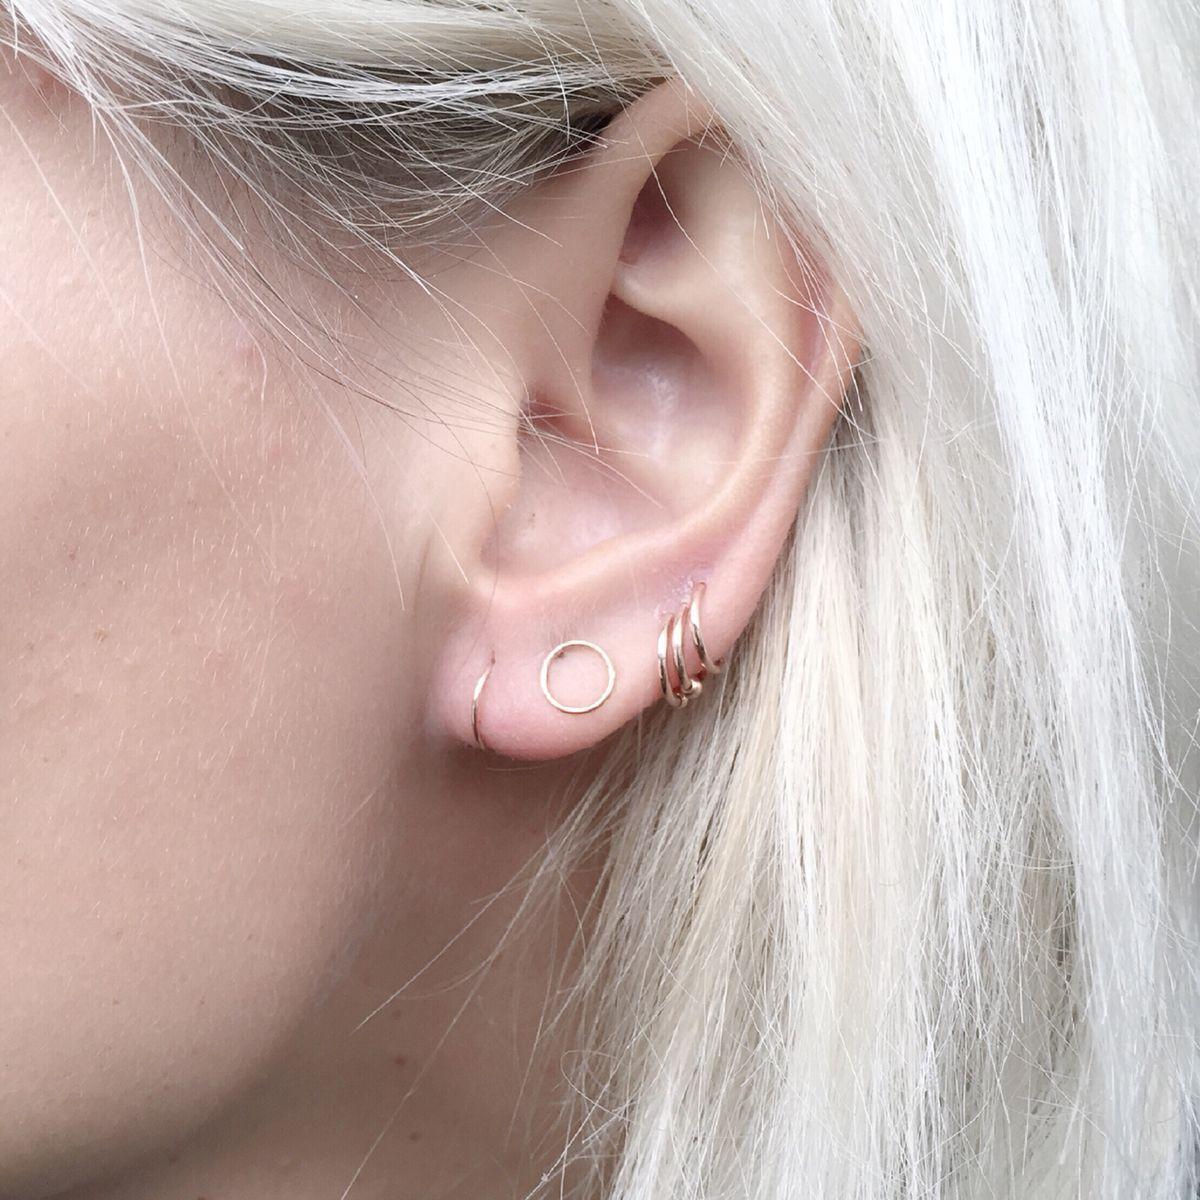 Pressure bump piercing  Minimalismo na bijuteria  pircing argola  Pinterest  Jewelry